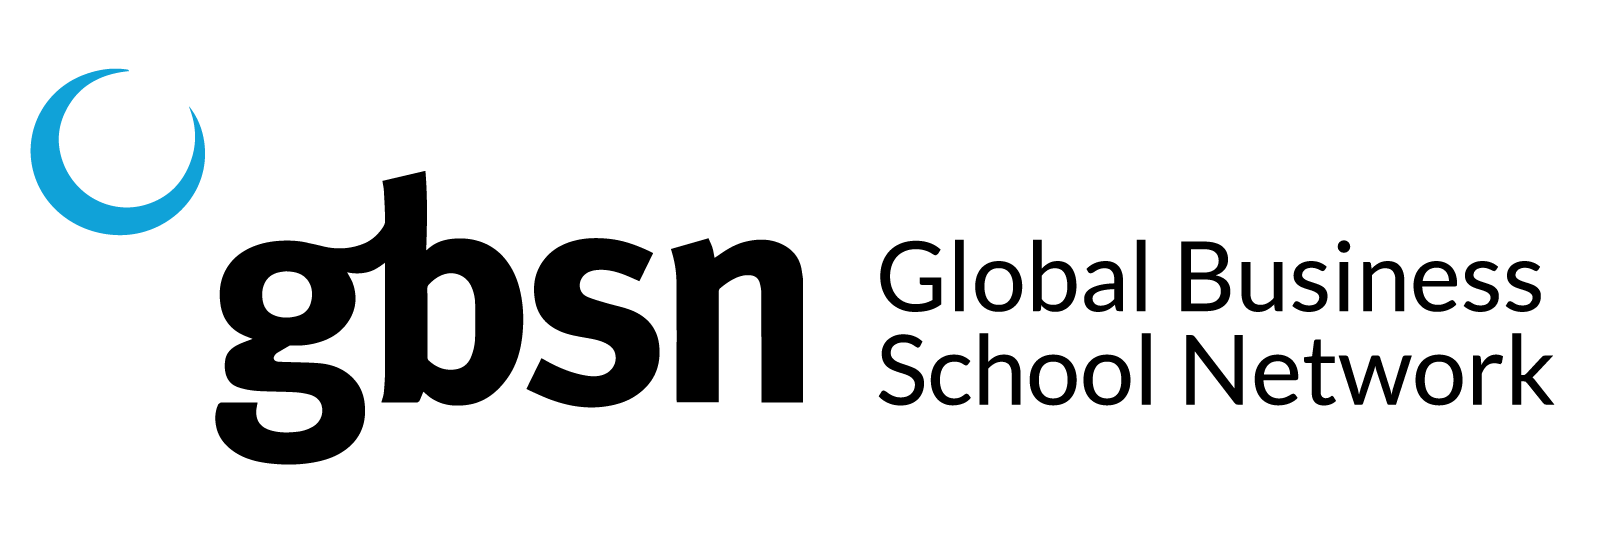 GDBS logo